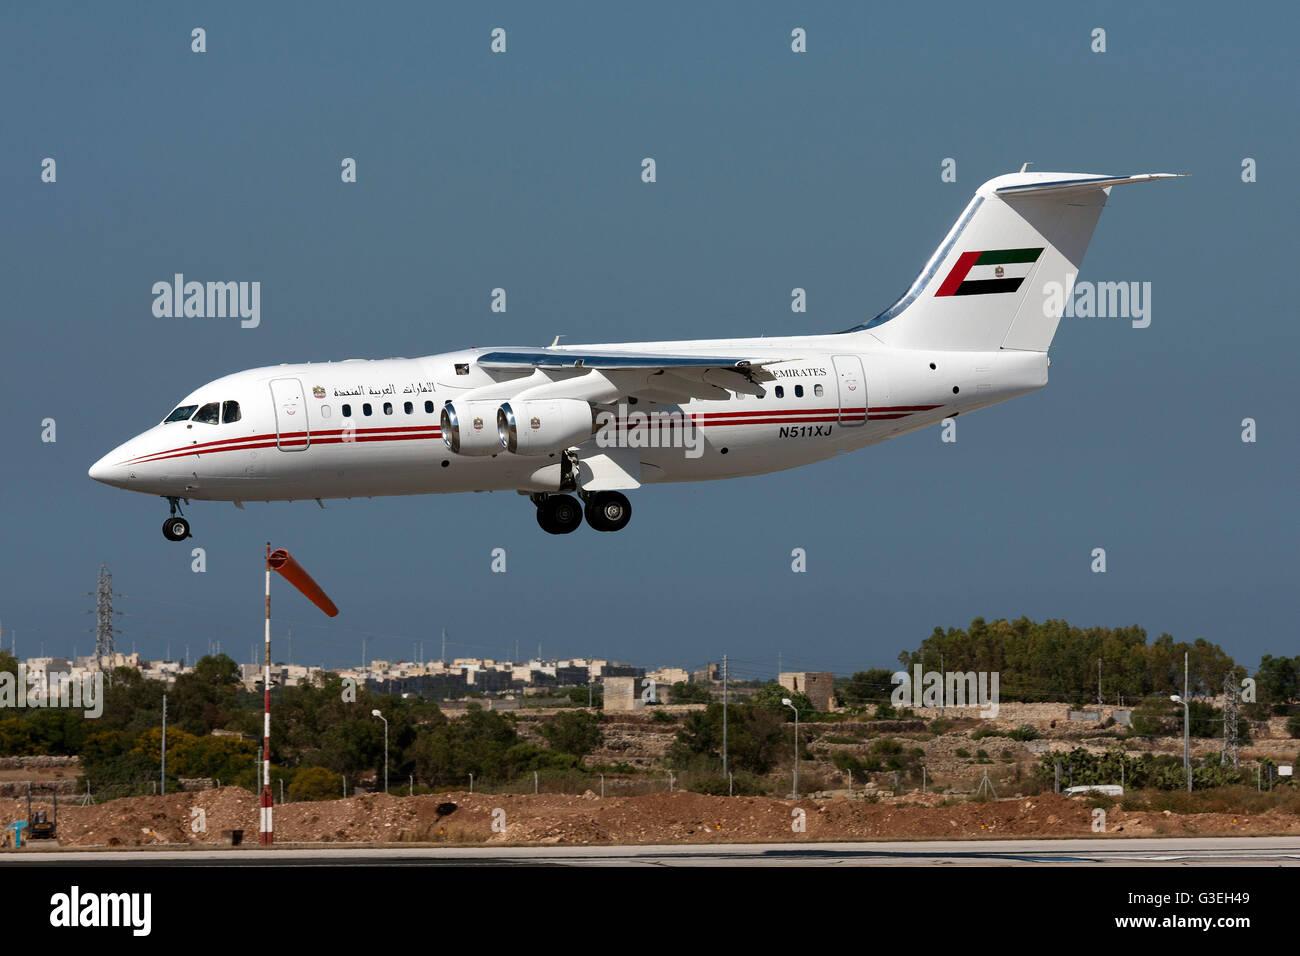 United Arab Emirates (Dubai Air Wing) British Aerospace Avro 146-RJ85A landing runway 31. Stock Photo